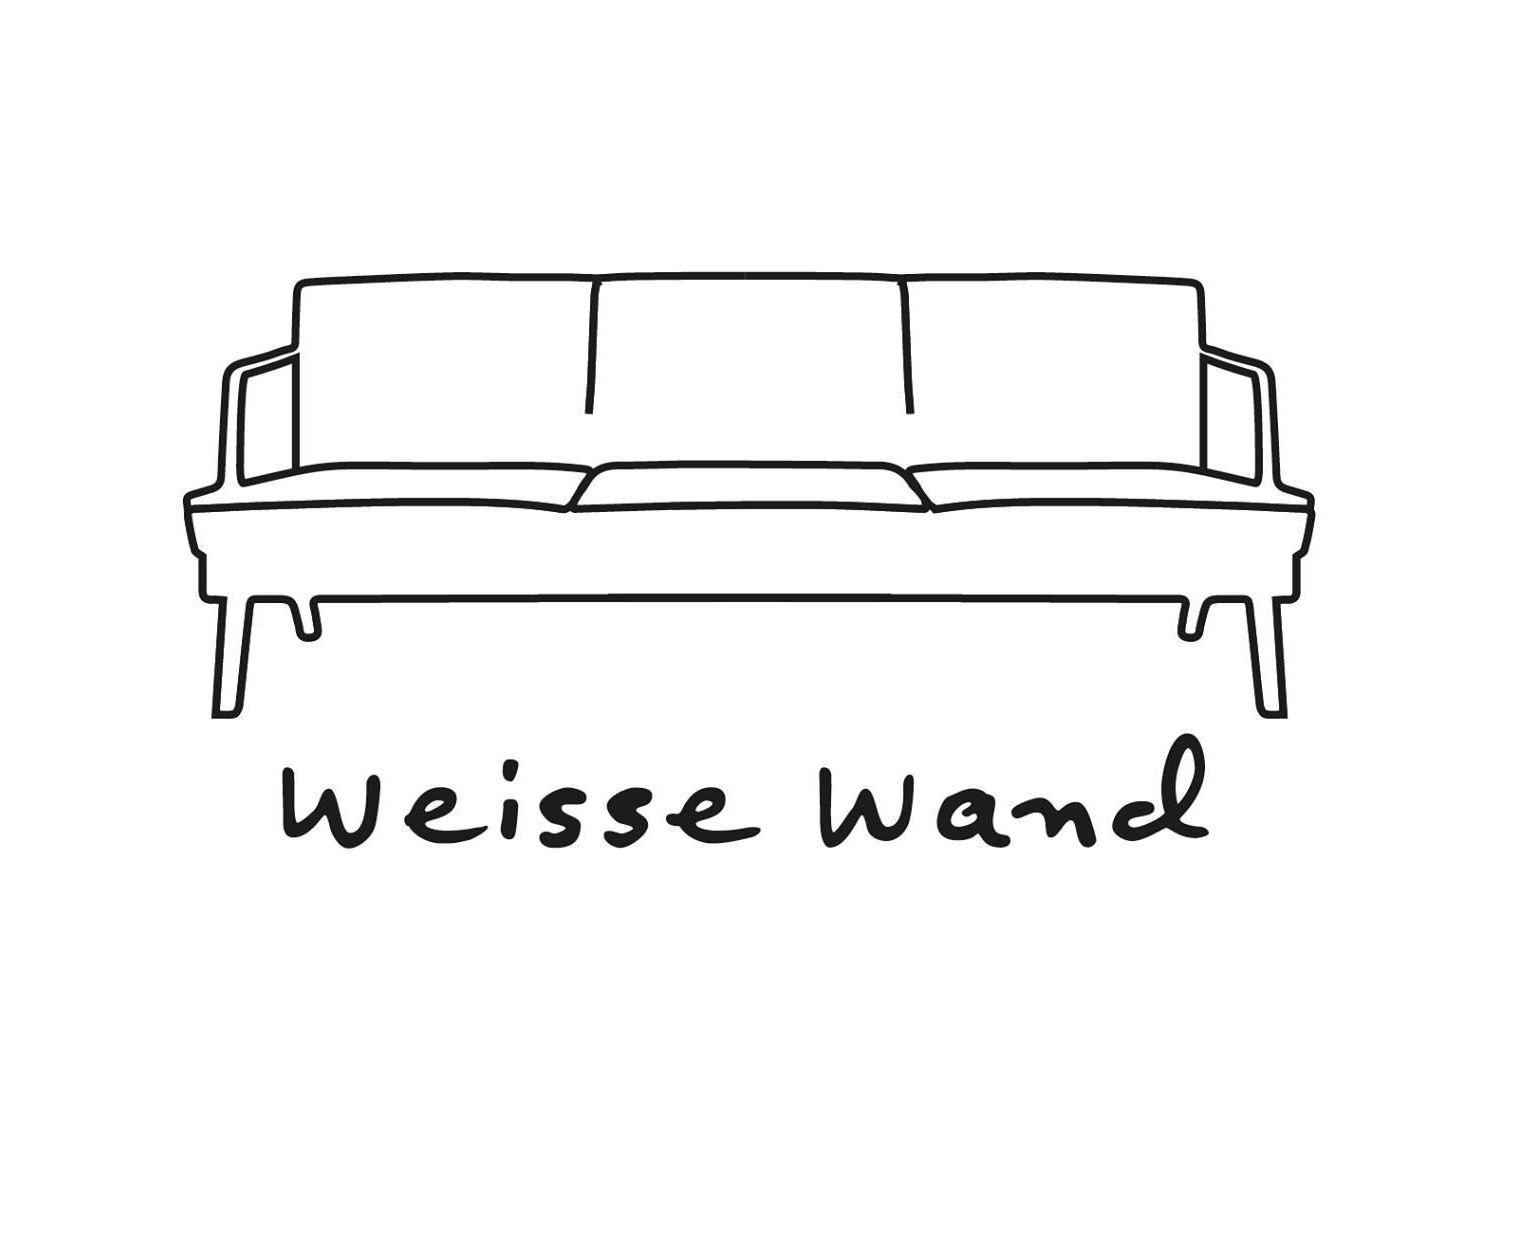 Weisse Wand Hof